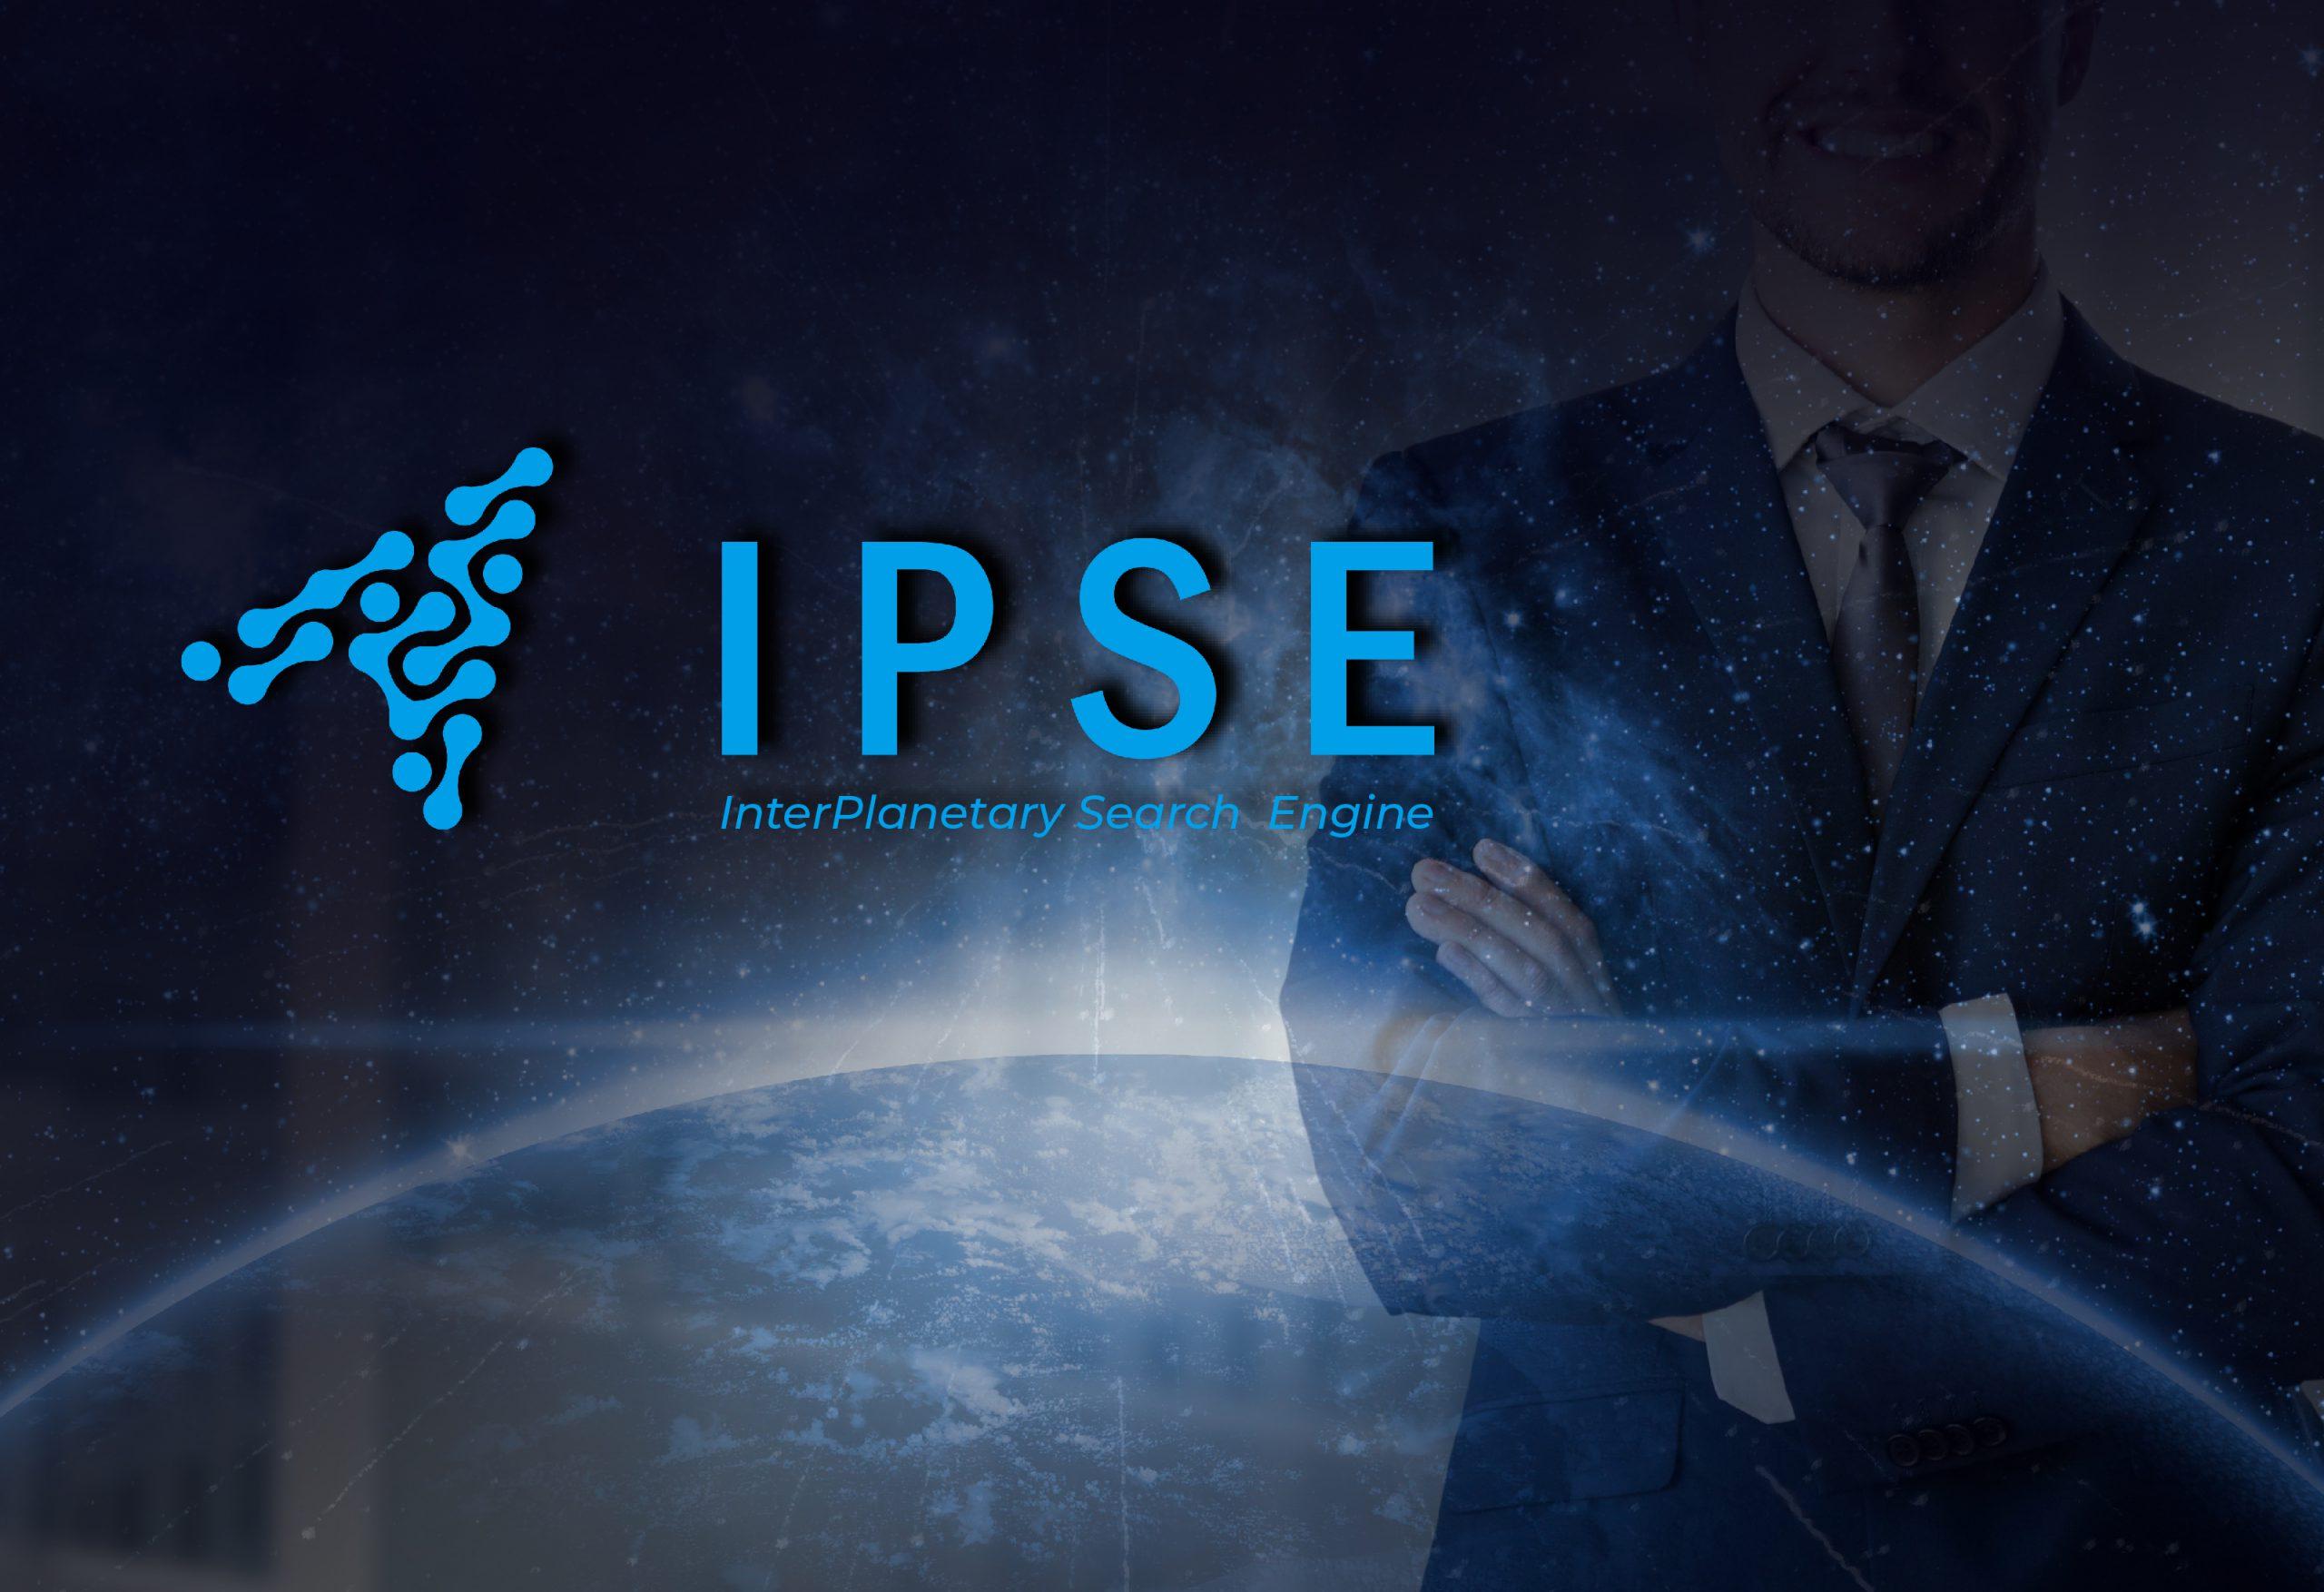 què es InterPlanetary Search Engine (IPSE) Bitnovo